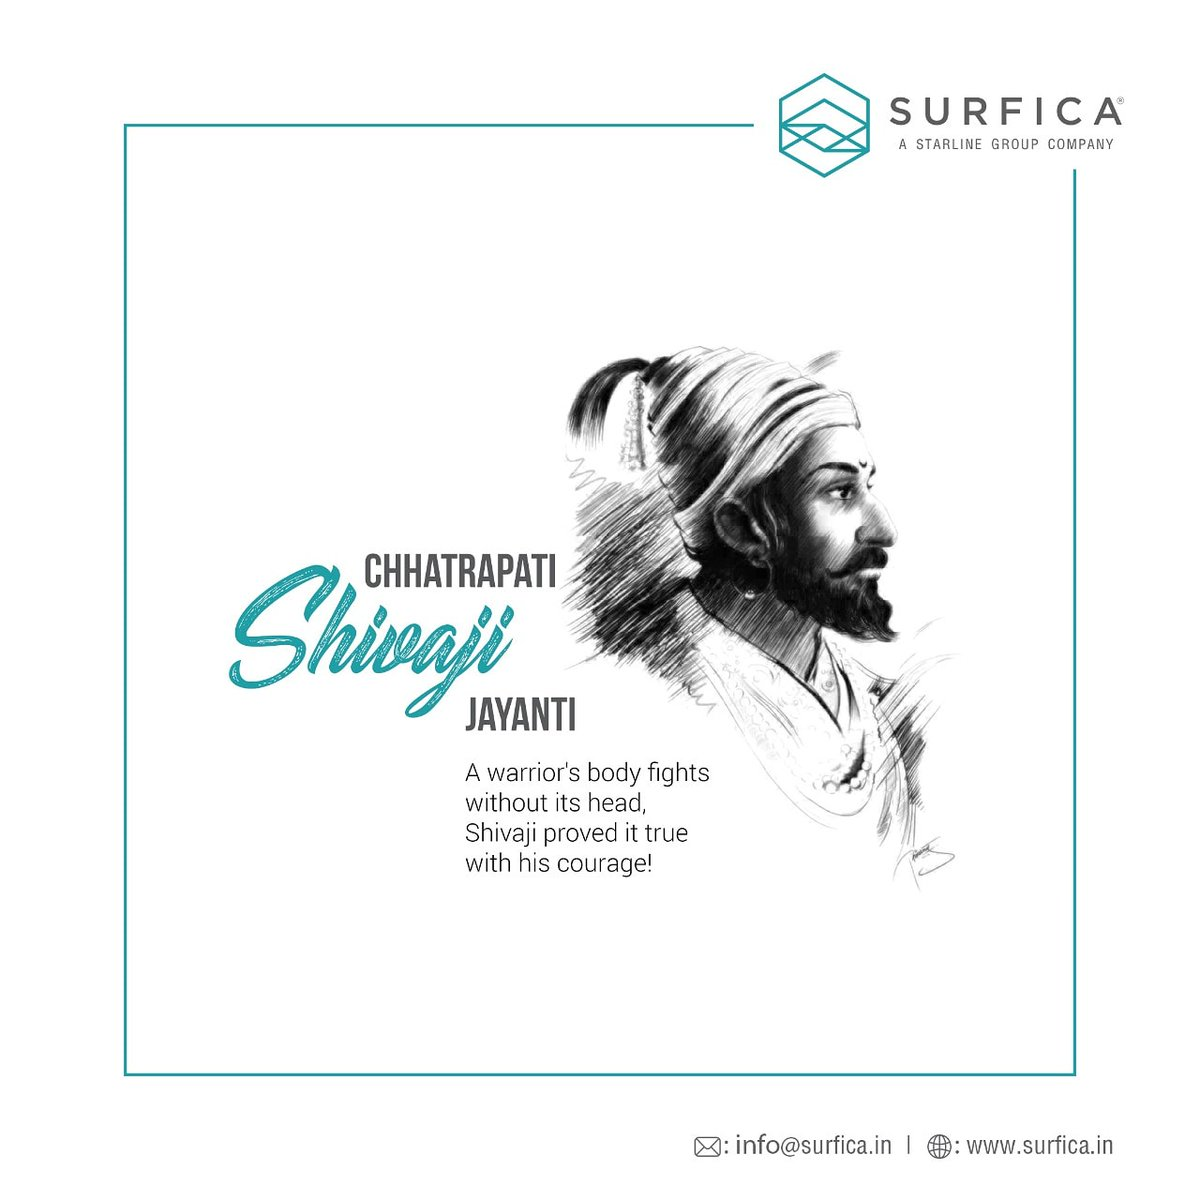 Shivaji raj is the true warrior who brought SWARAJ. We pay tribute to him and all such soldiers on this day.  #shivajimaharaj#shivajijayanti#jayshivaji#harharmahadev#maratha#marathawarrior#shivajiwishes#greetings pic.twitter.com/aRcUarueW4